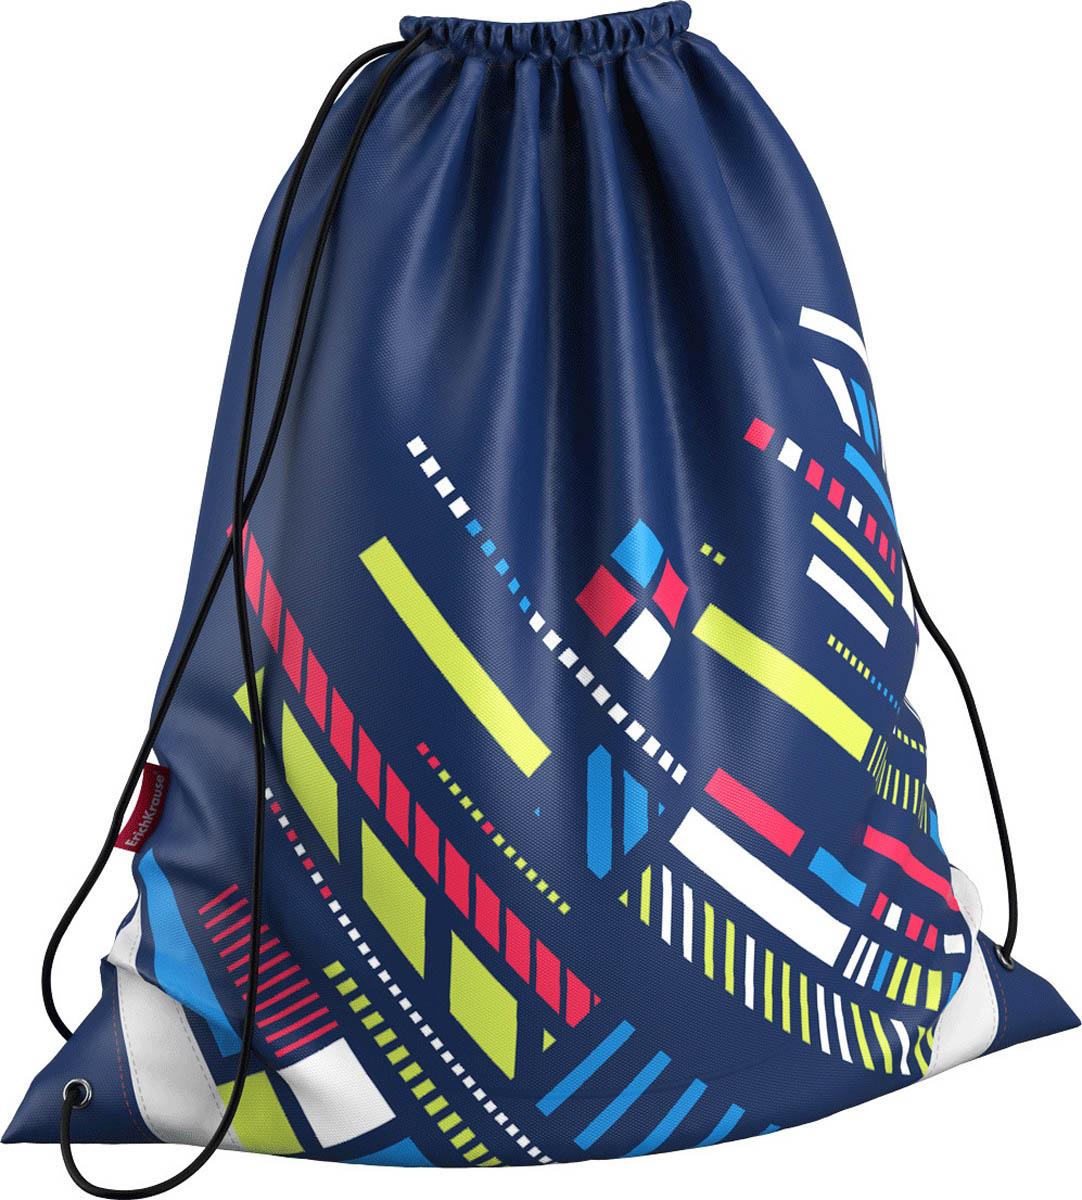 Erich Krause Сумка для сменной обуви Graphic side floral graphic fishnet tights